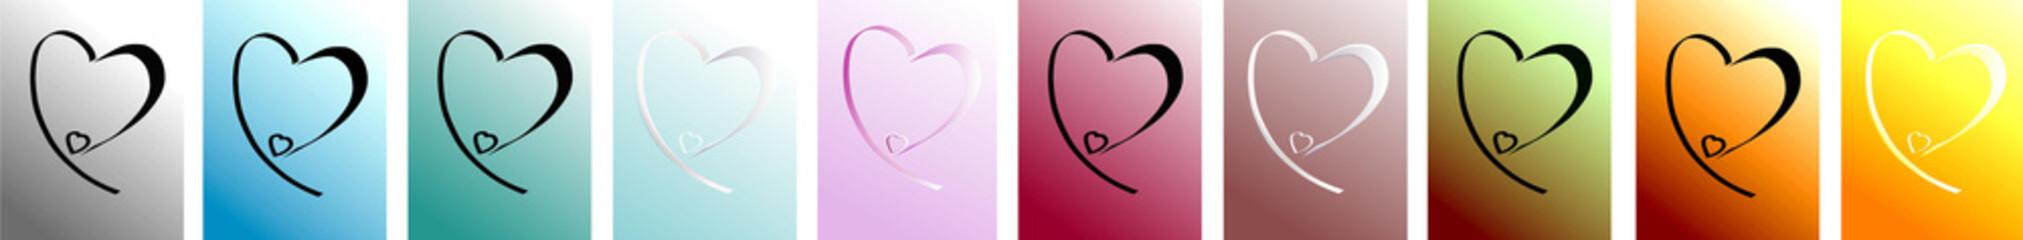 Coeurs planche